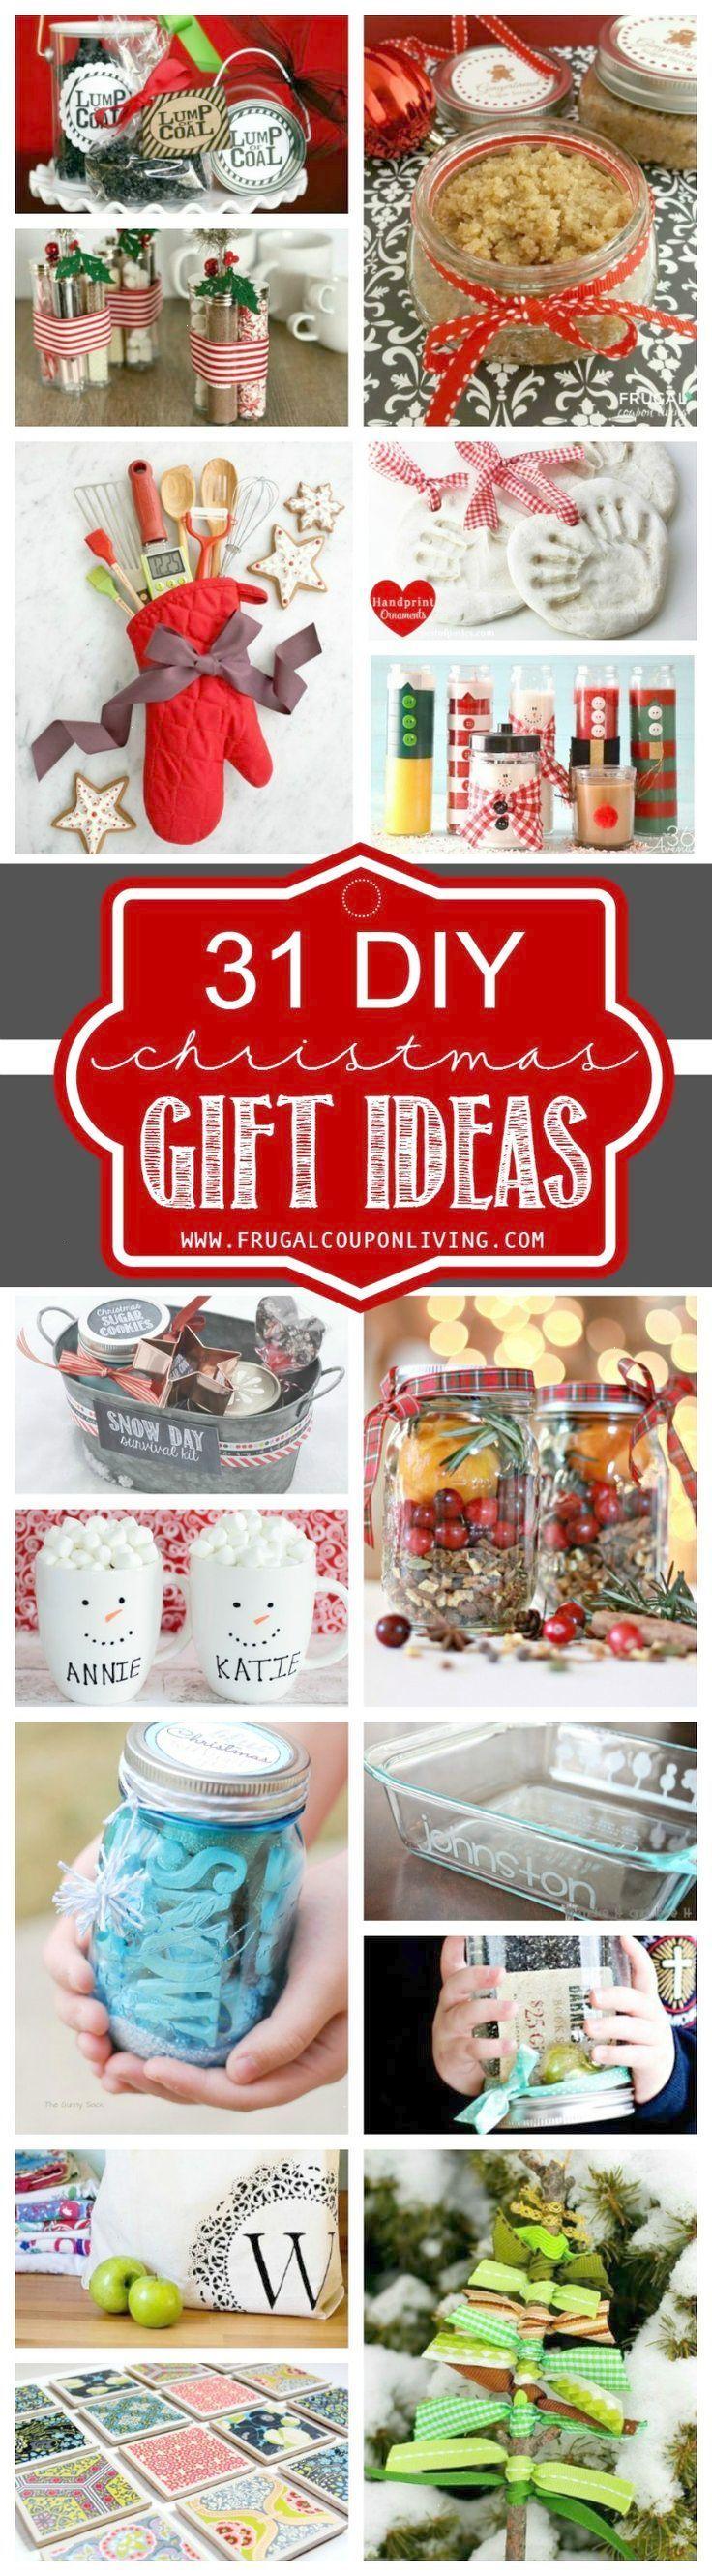 31 Diy Christmas Gift Ideas On Frugal Coupon Living Homemade